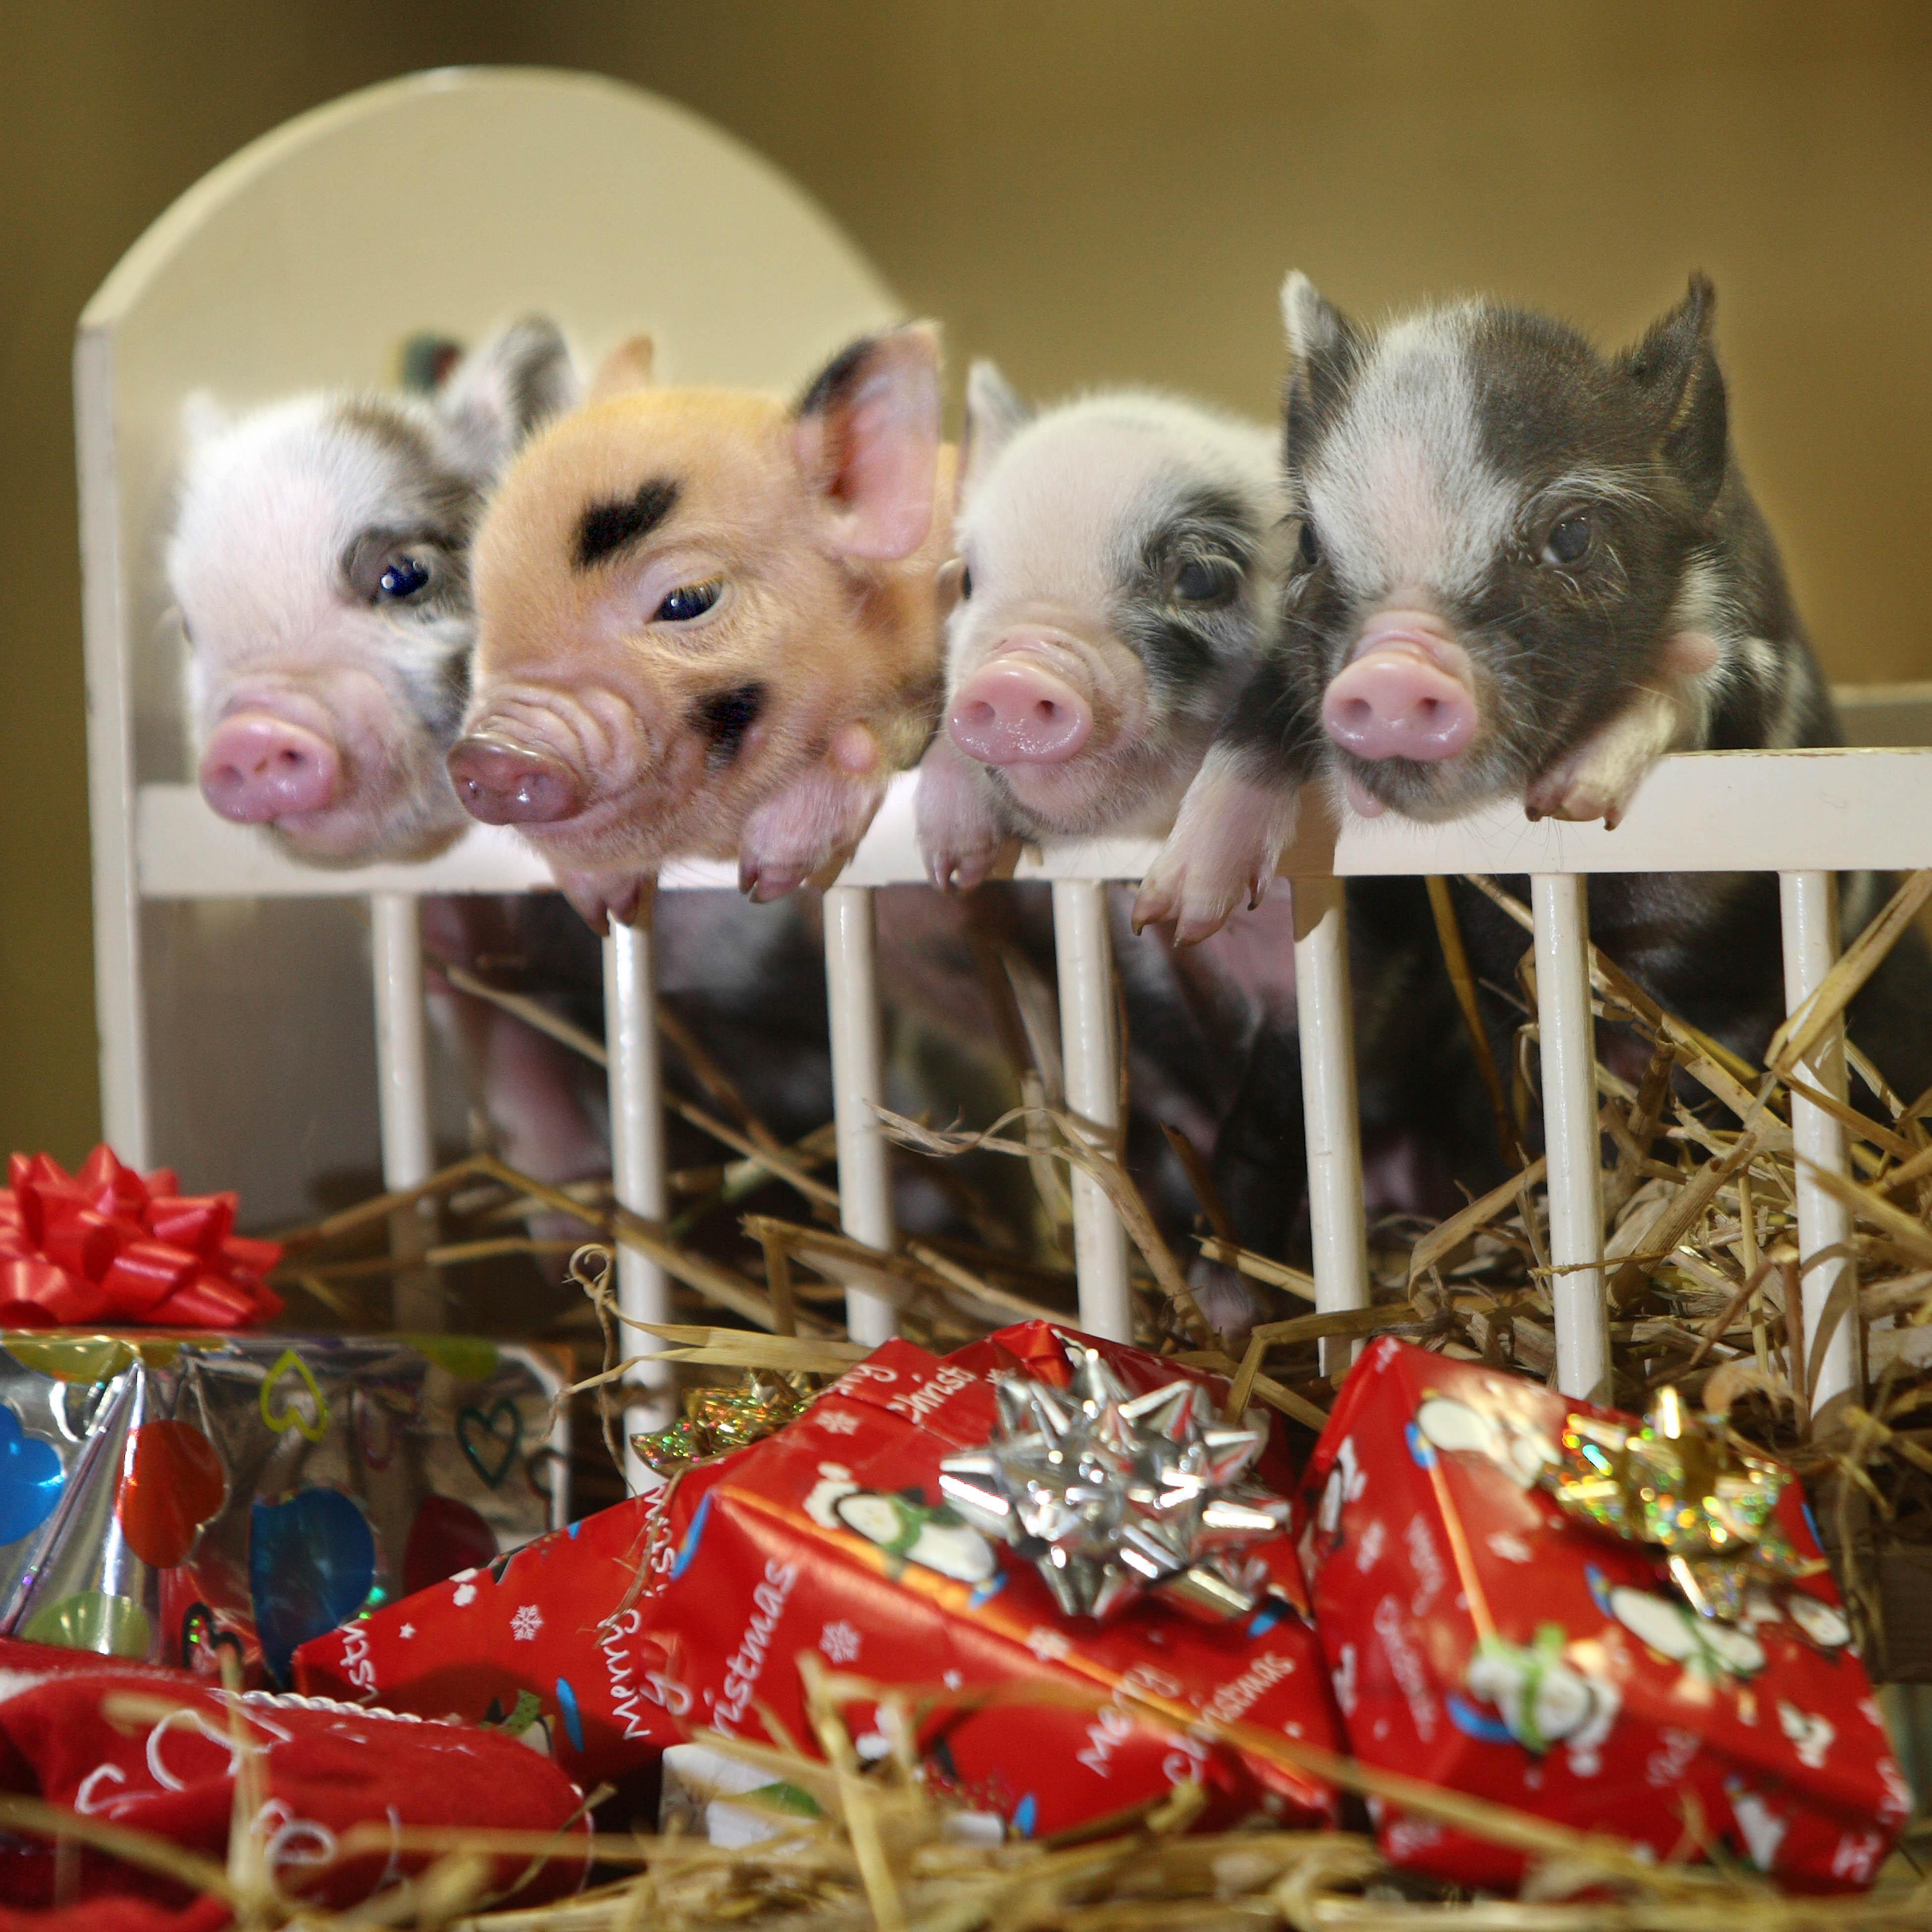 Cute Piglets Wallpaper Animals Love Christmas Richardaustinimages